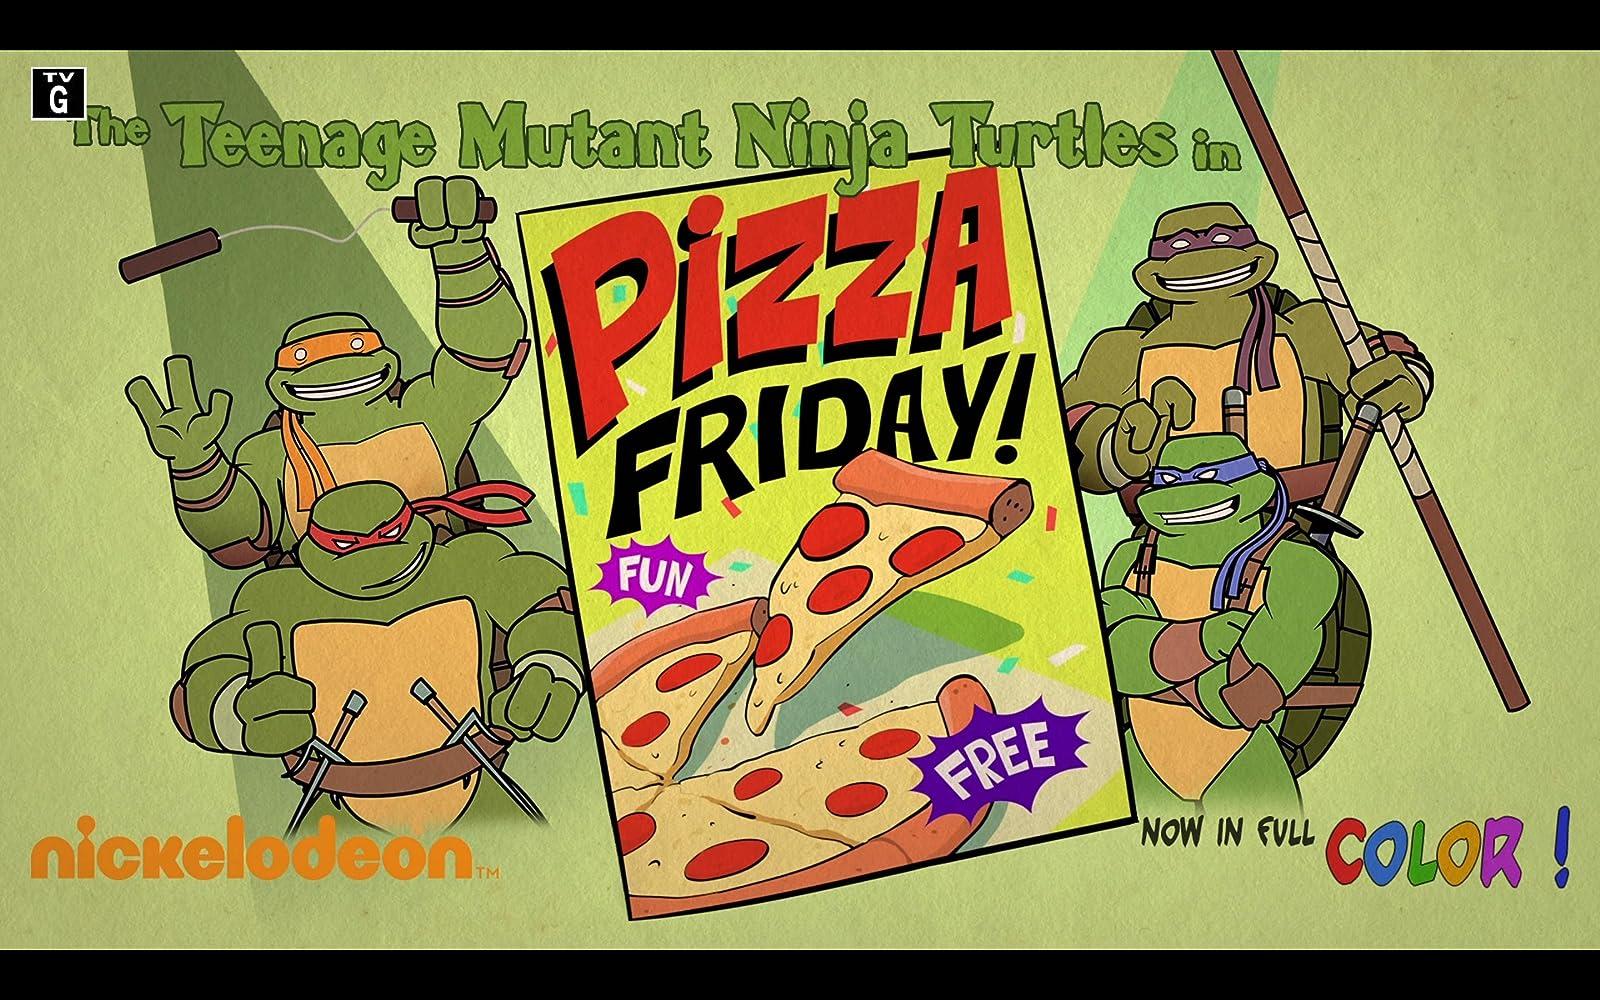 Teenage Mutant Ninja Turtles In Pizza Friday 2016